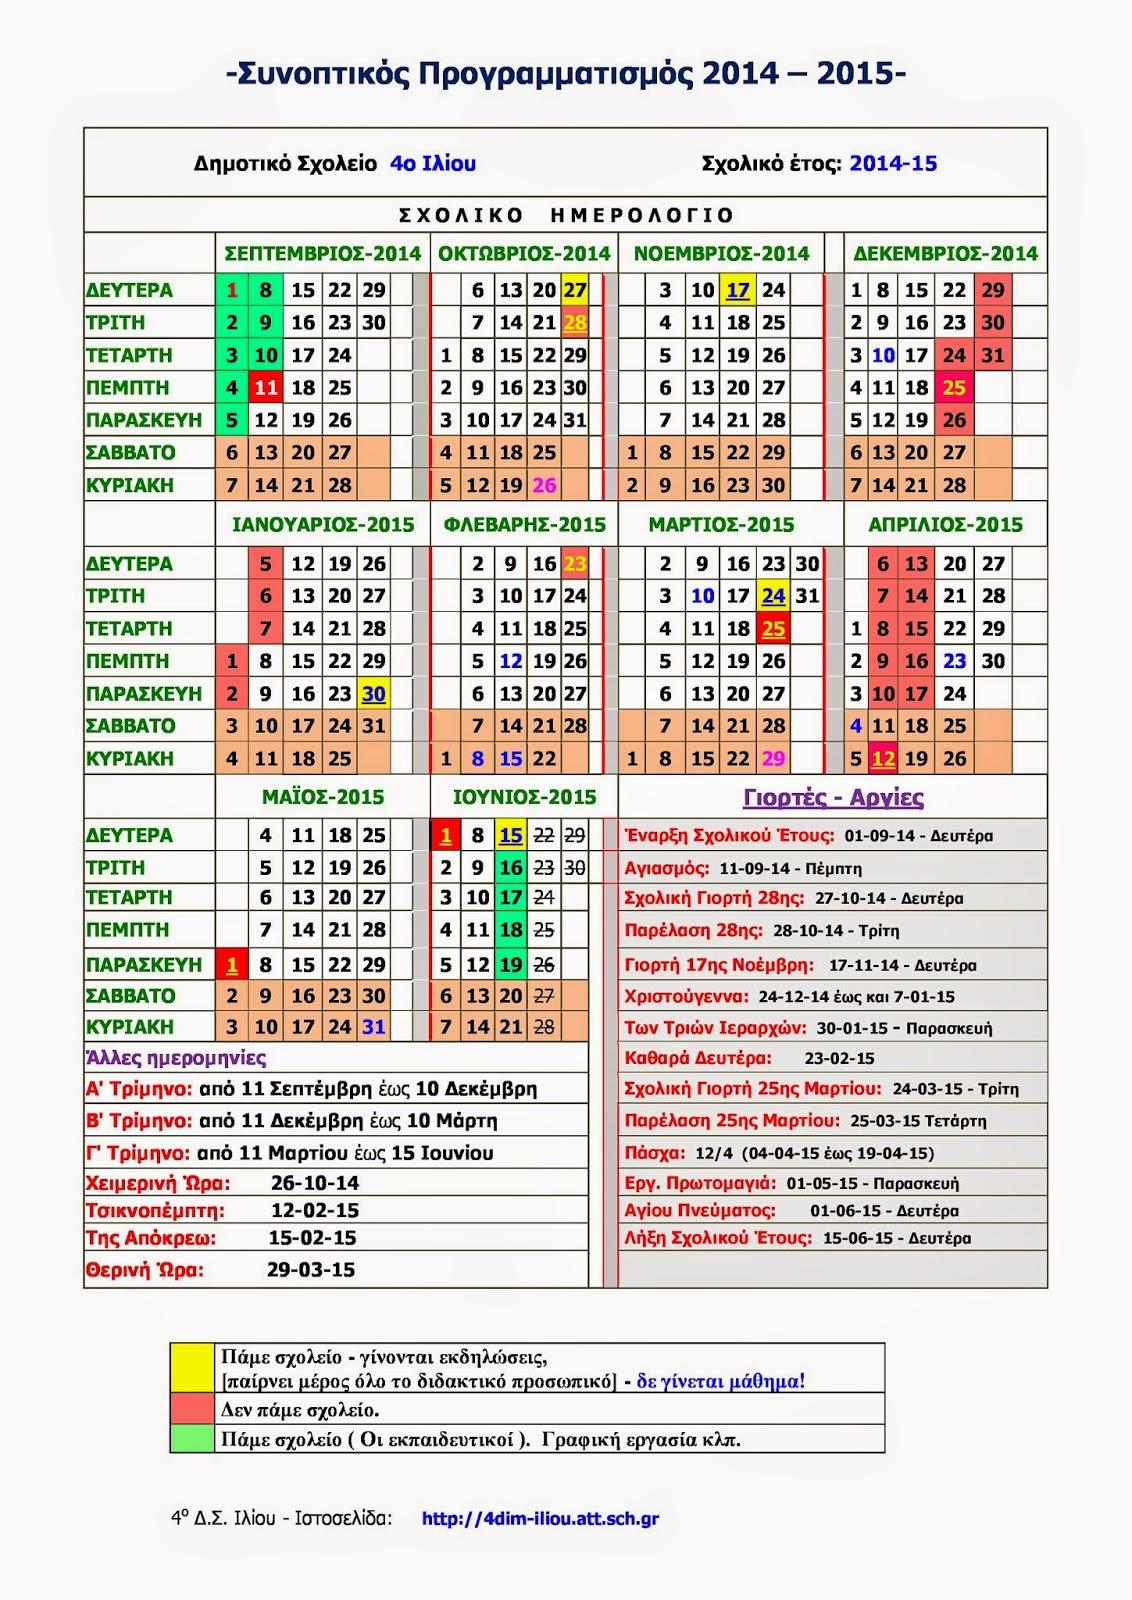 http://4dim-iliou.att.sch.gr/programmatismos/2014-2015-programmatismos/programmatismos-didaktikoy-ergoy-14-15.htm